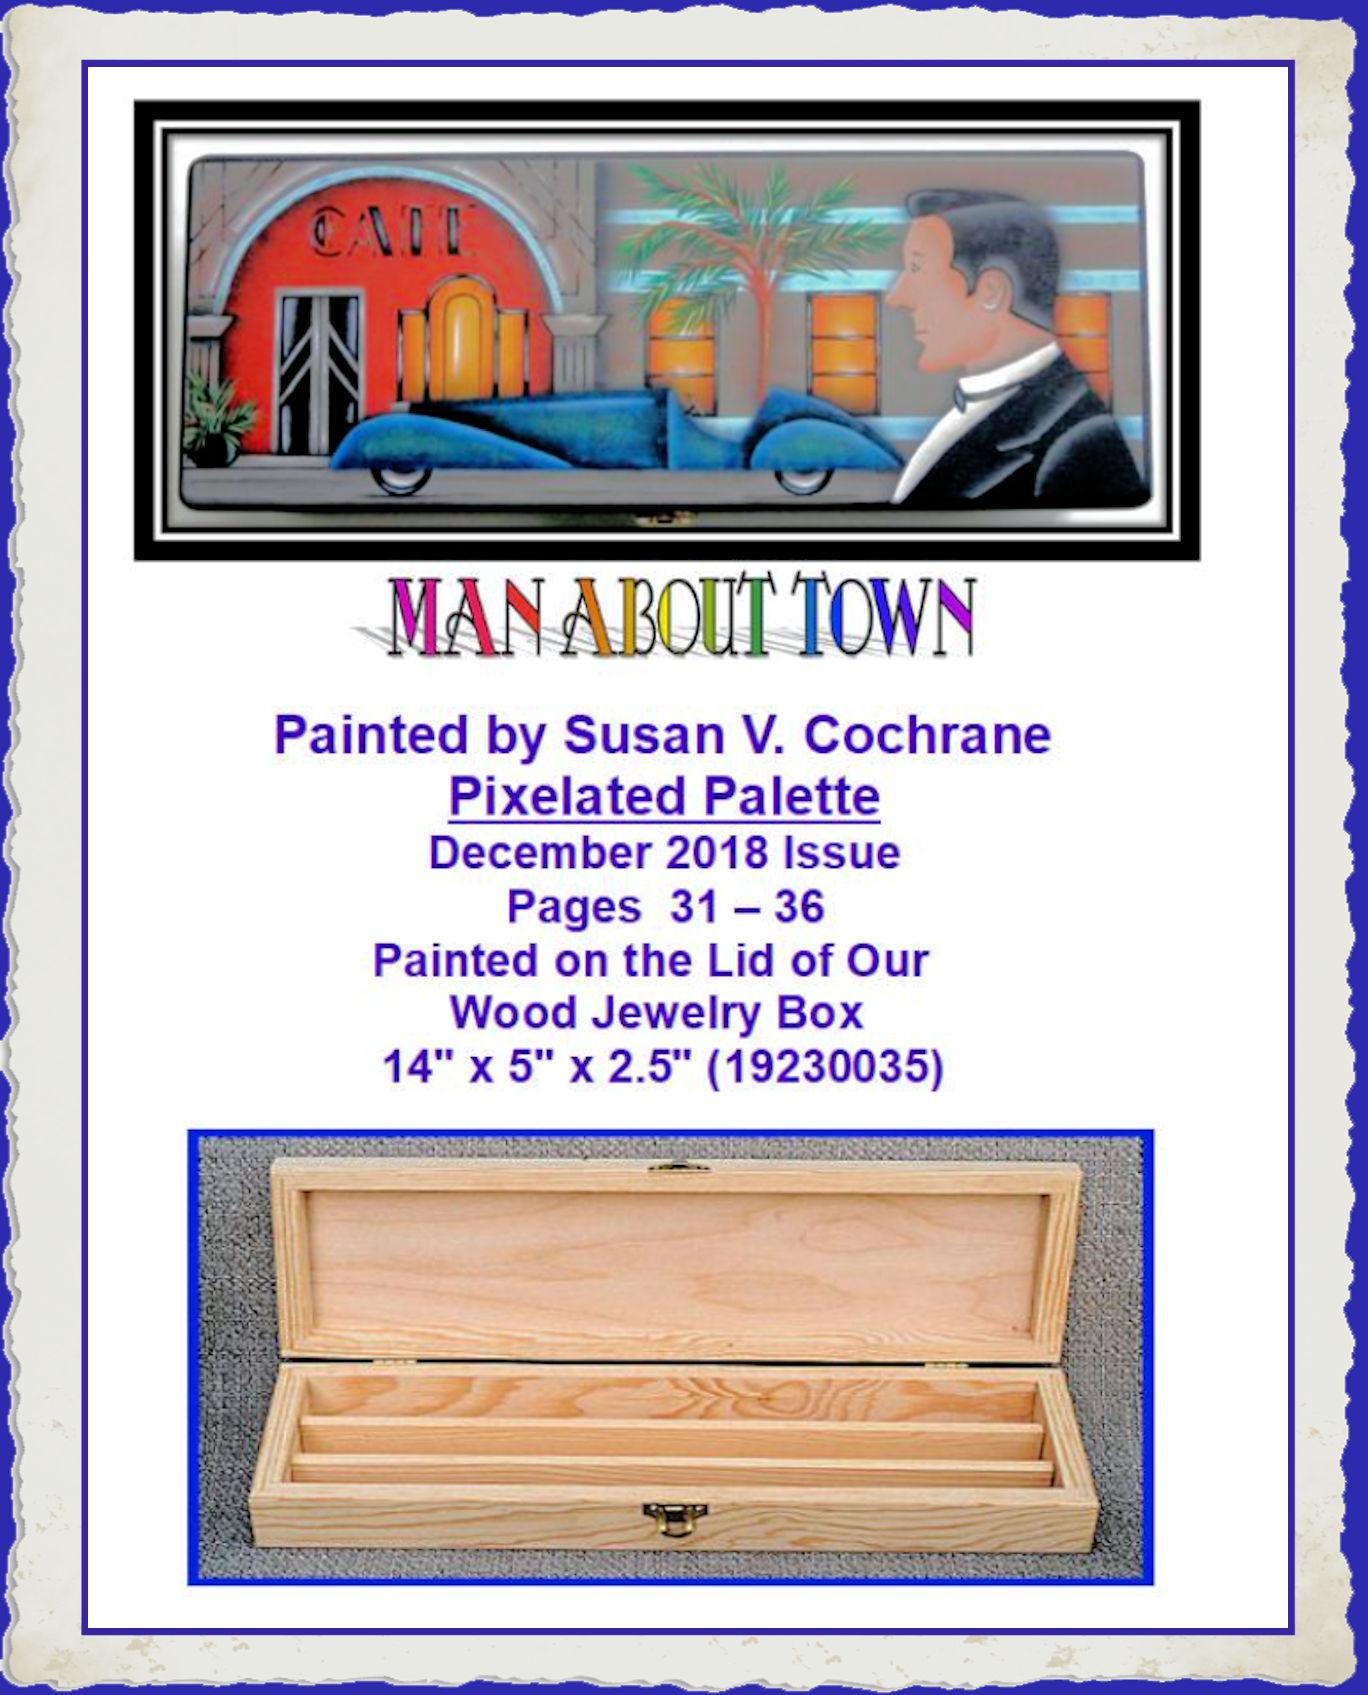 wood-jewelry-box-pixelated-palette-19230035-framed.jpg